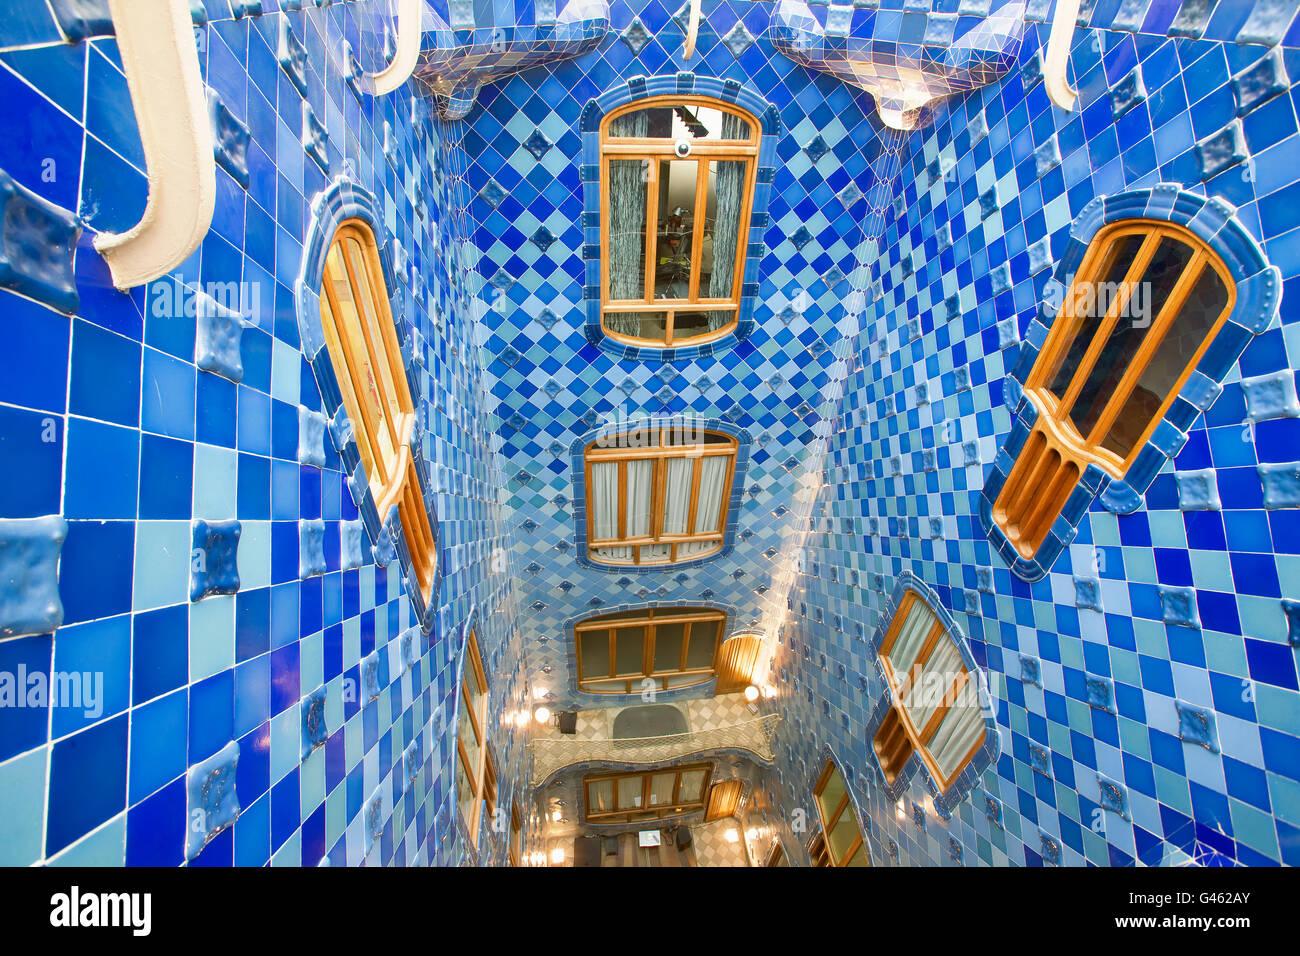 The casa Batllo by Gaudi in Barcelona - Stock Image